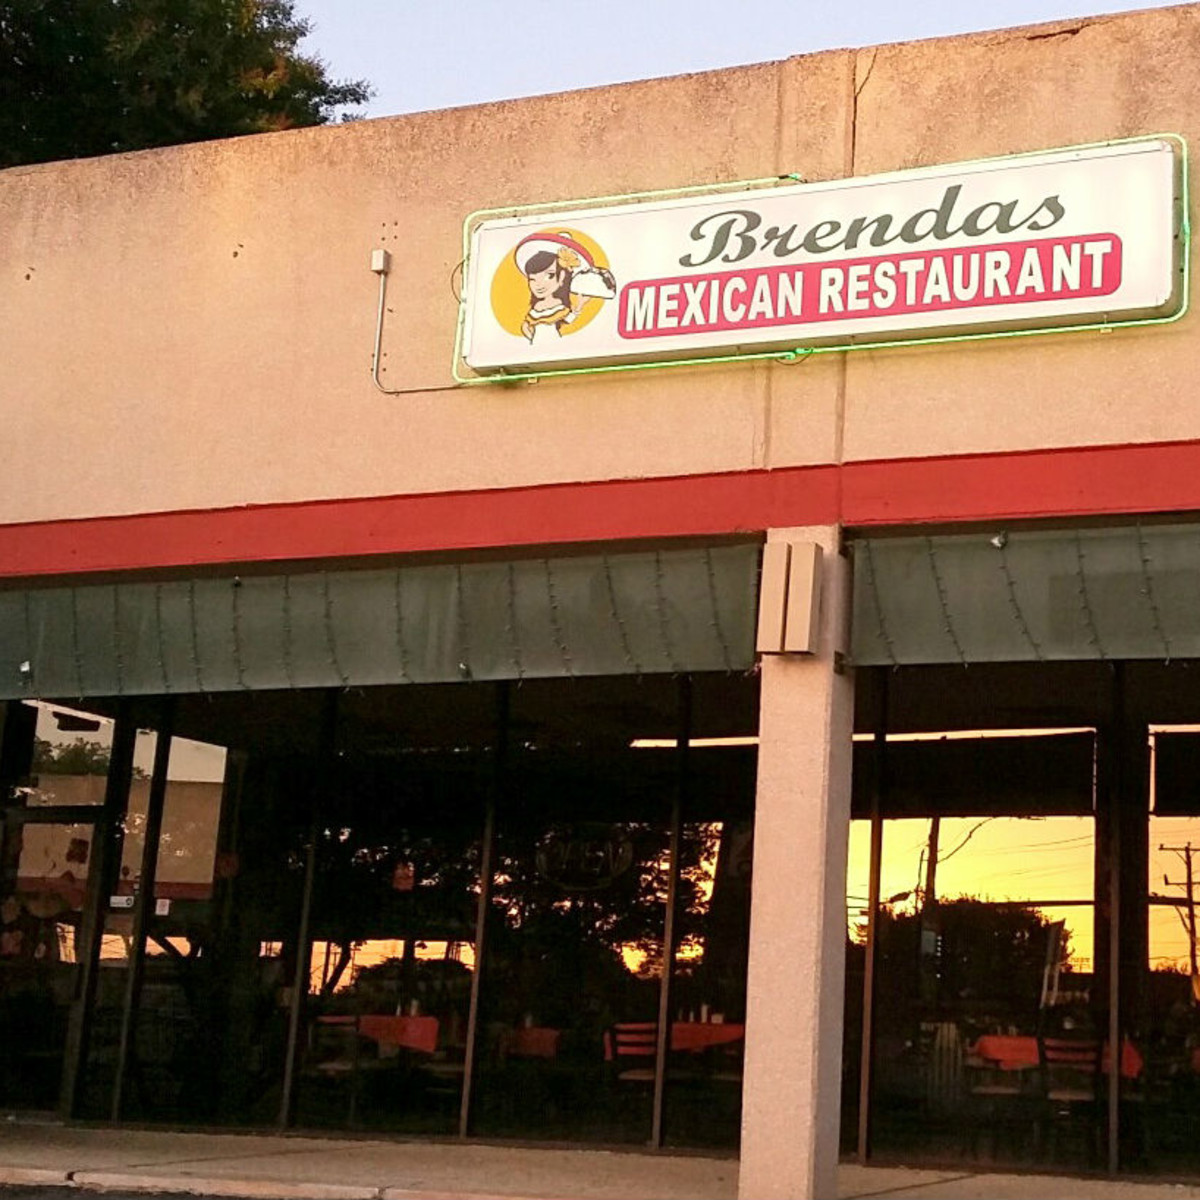 Brenda's Mexican Restaurant